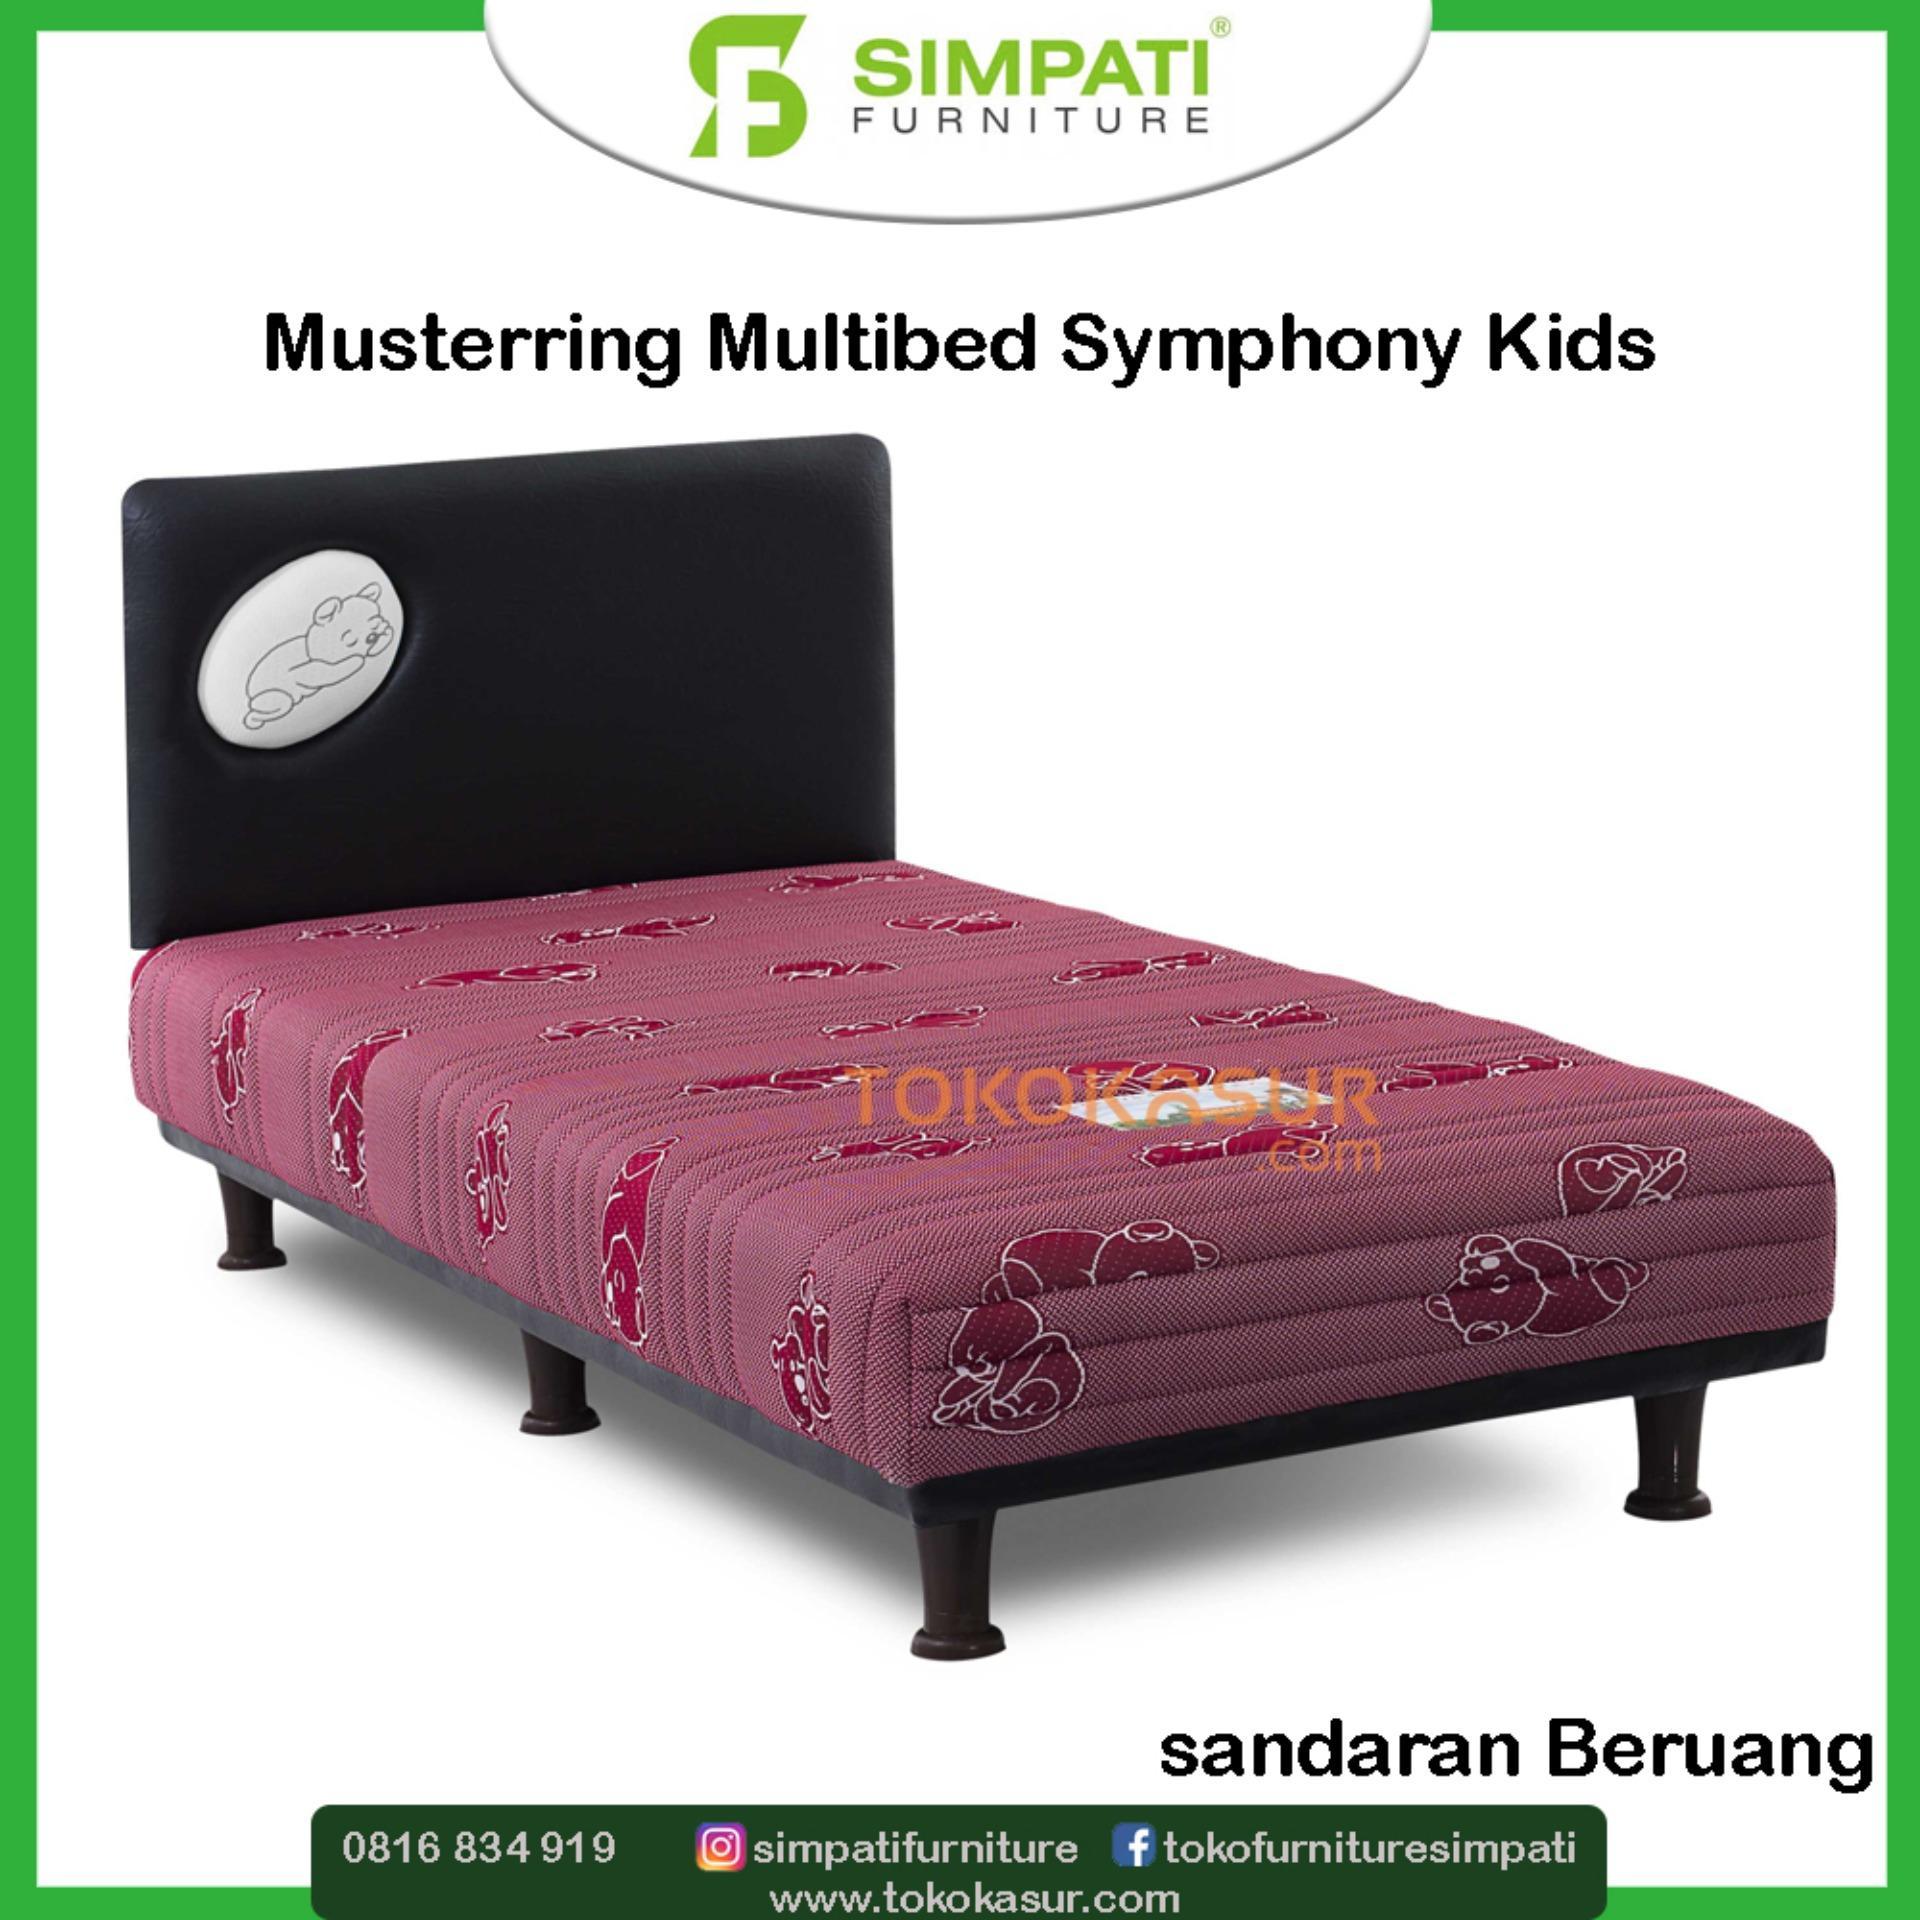 Multibed Musterring Symphony Kids 120x200 Komplit Set Beruang